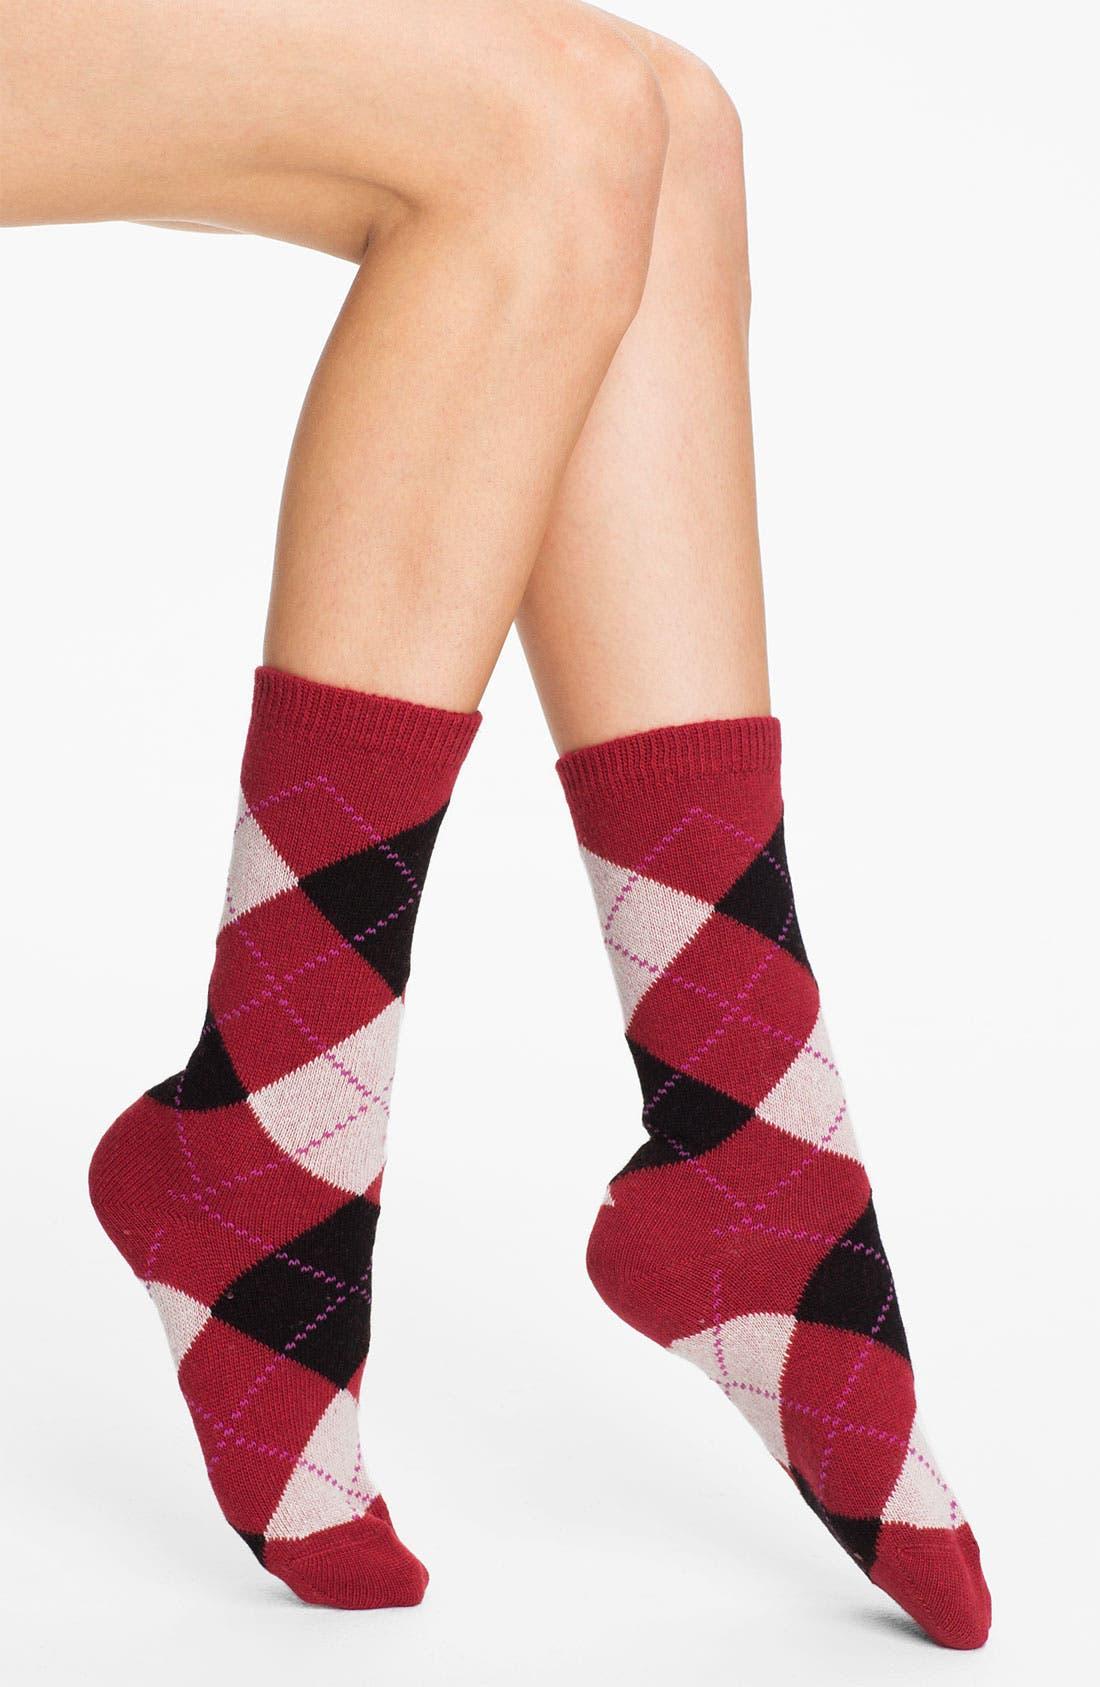 Main Image - Nordstrom Argyle Crew Socks